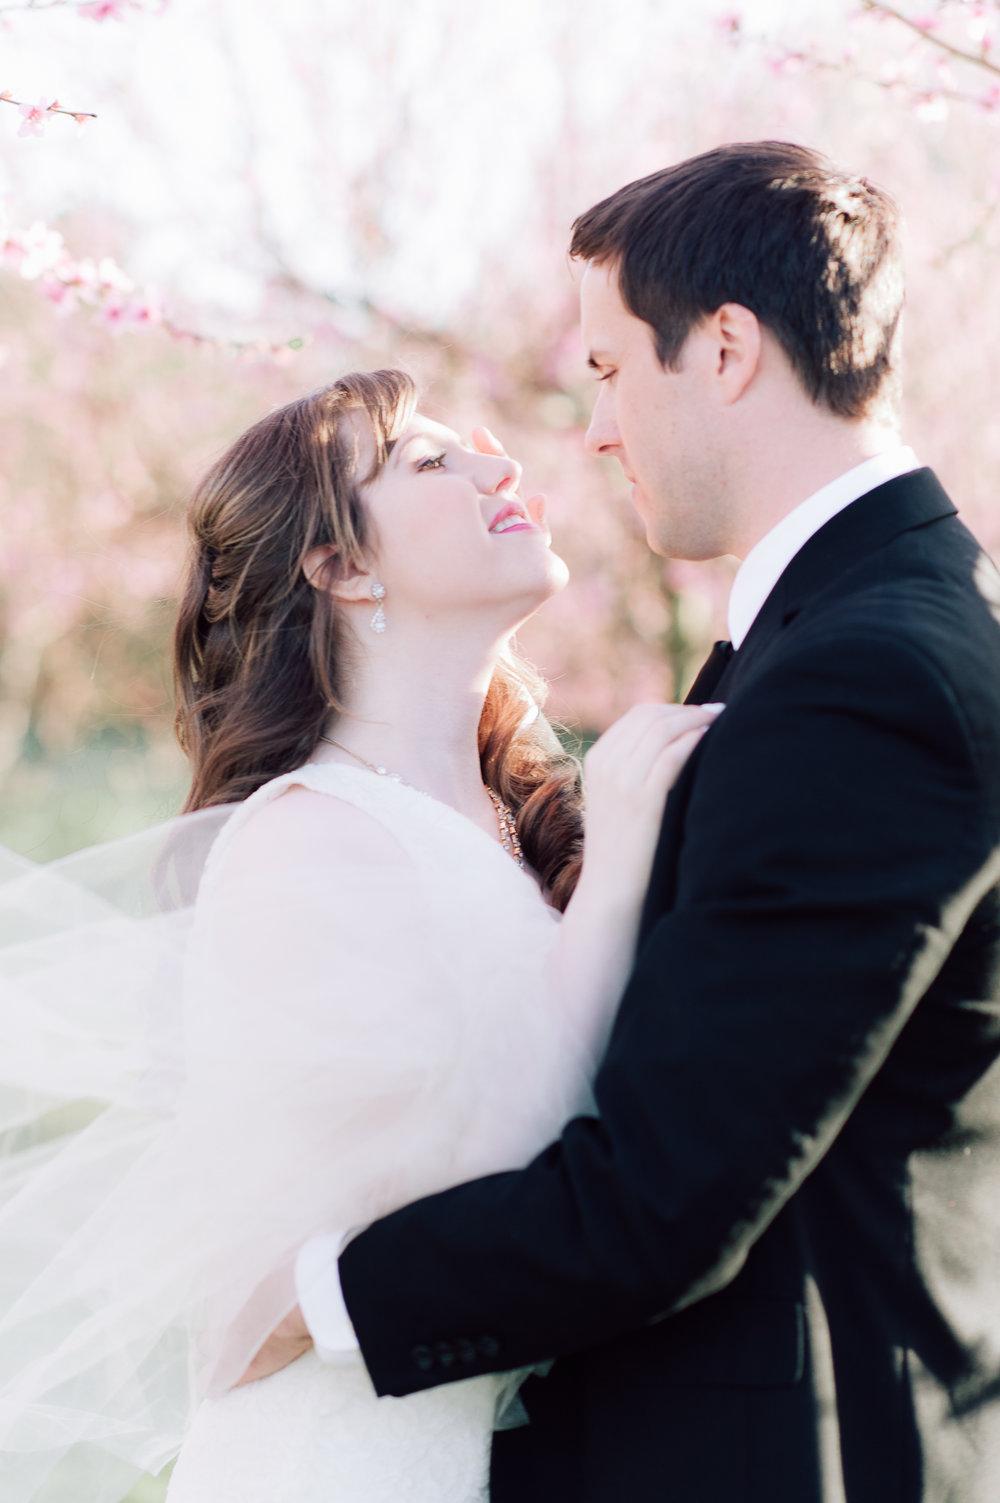 springwedding_cherryblossoms_virginiaphotographer_youseephotography_styledshoot (538).jpg